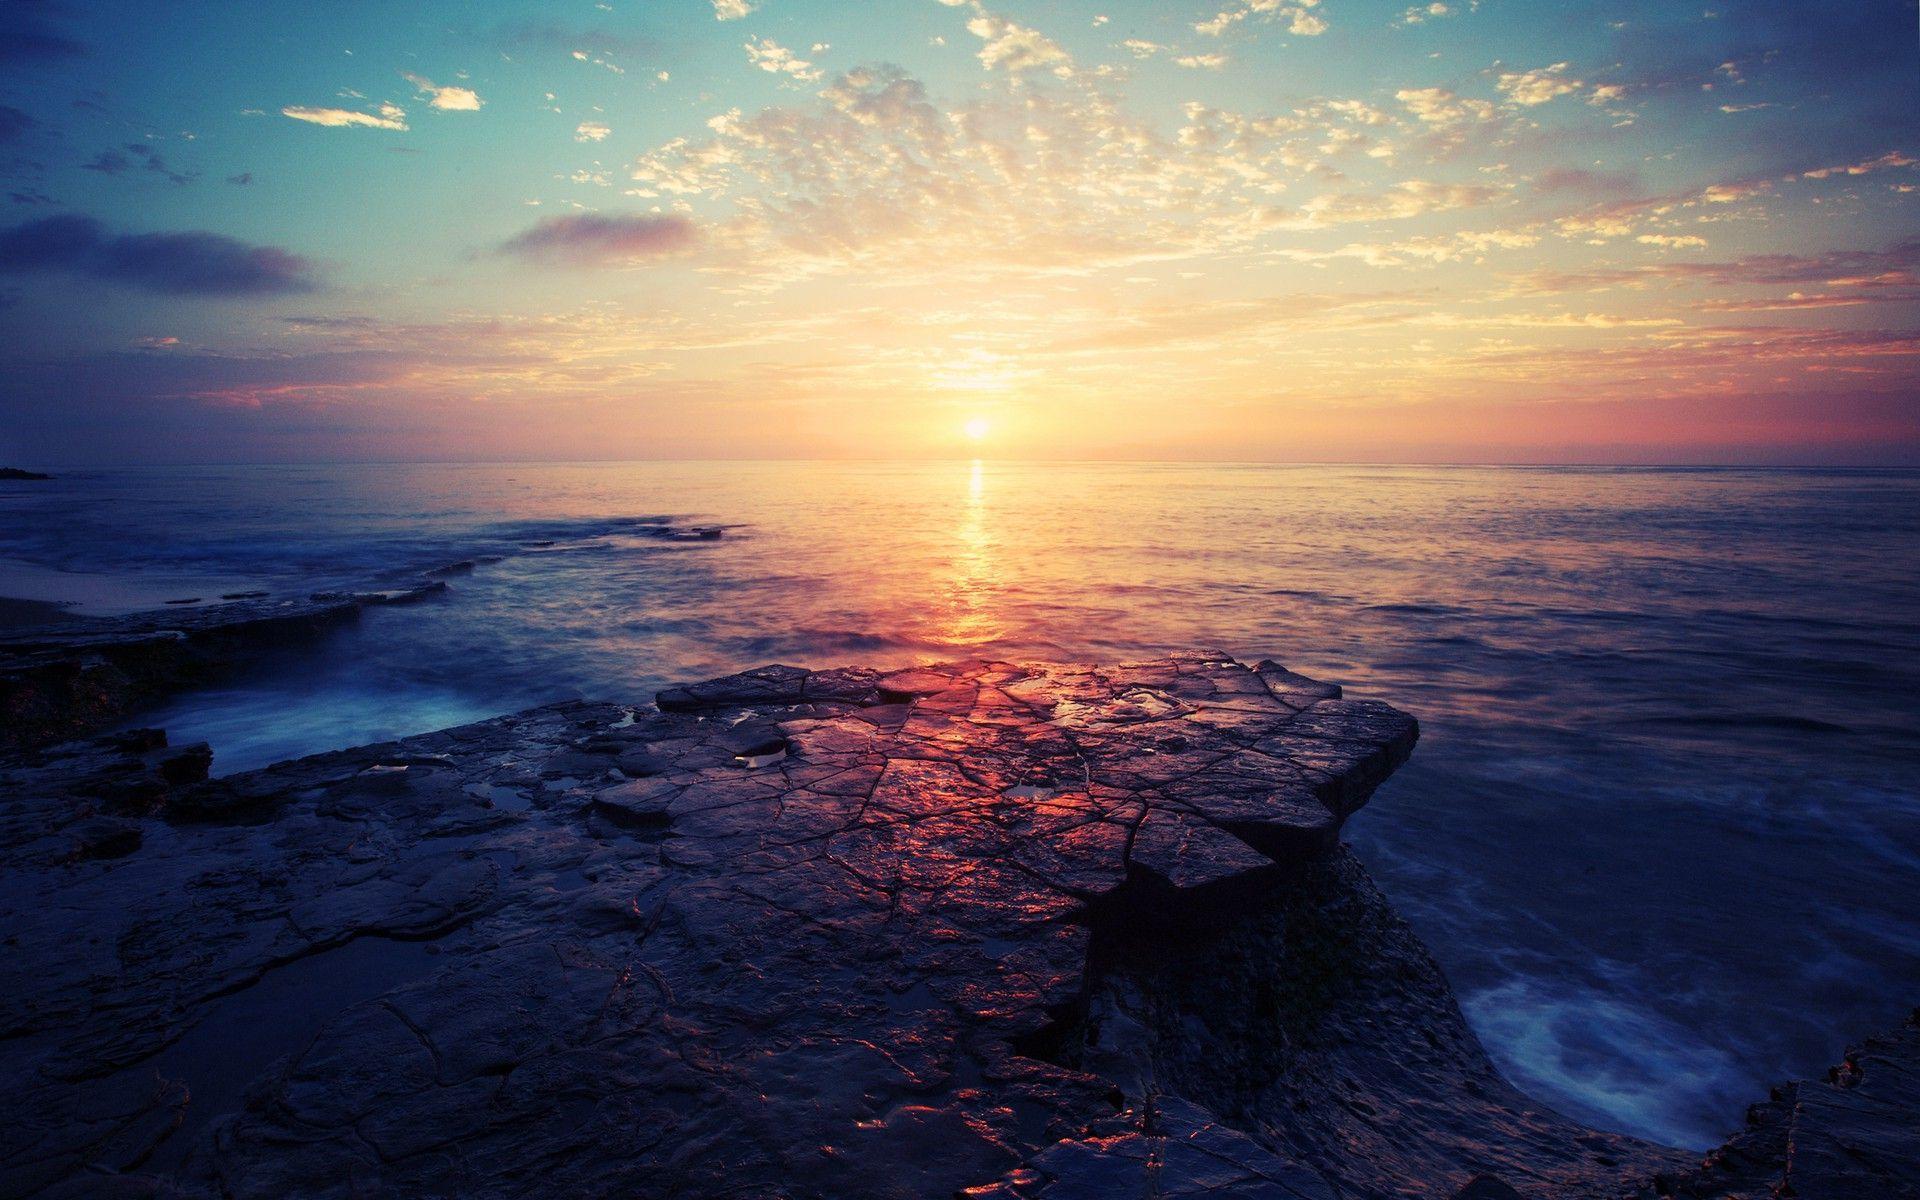 Sunrise Wallpapers - Wallpaper Cave